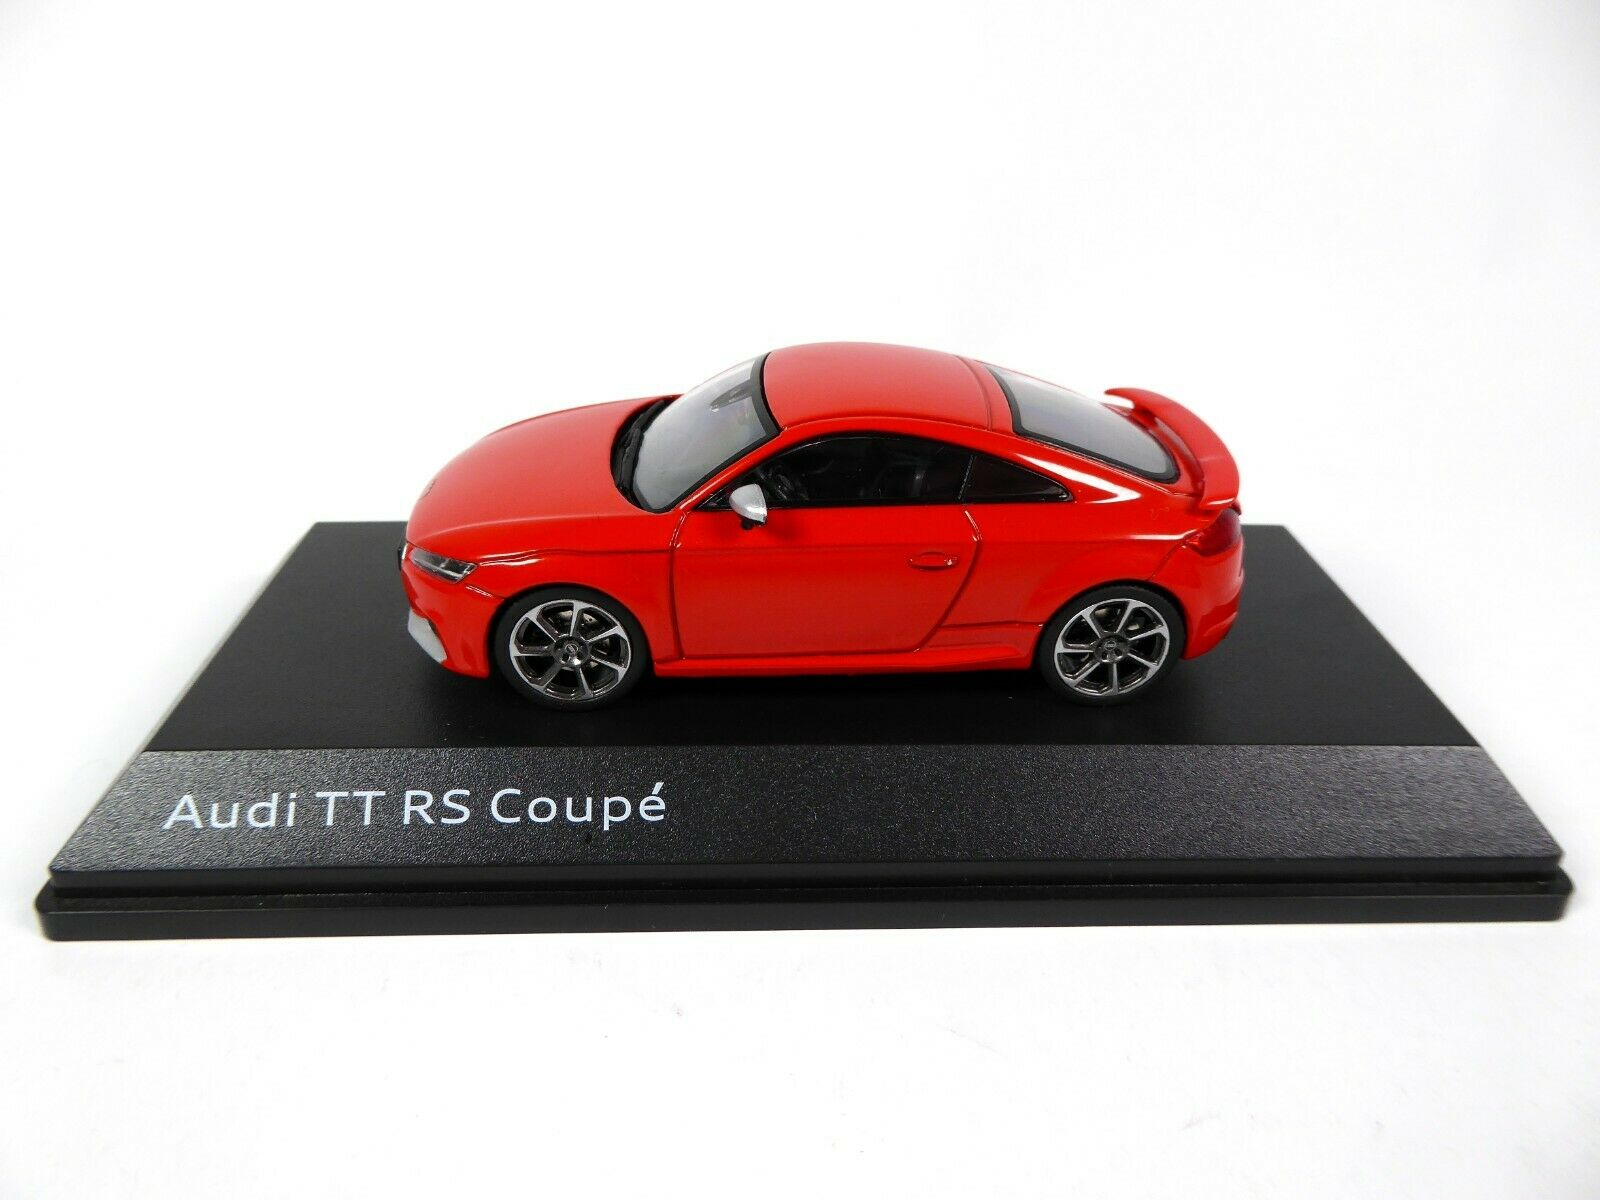 Audi TT RS 8S Coupé 1:43 Catalunyarot 5011610431 Modellauto Rot iScale